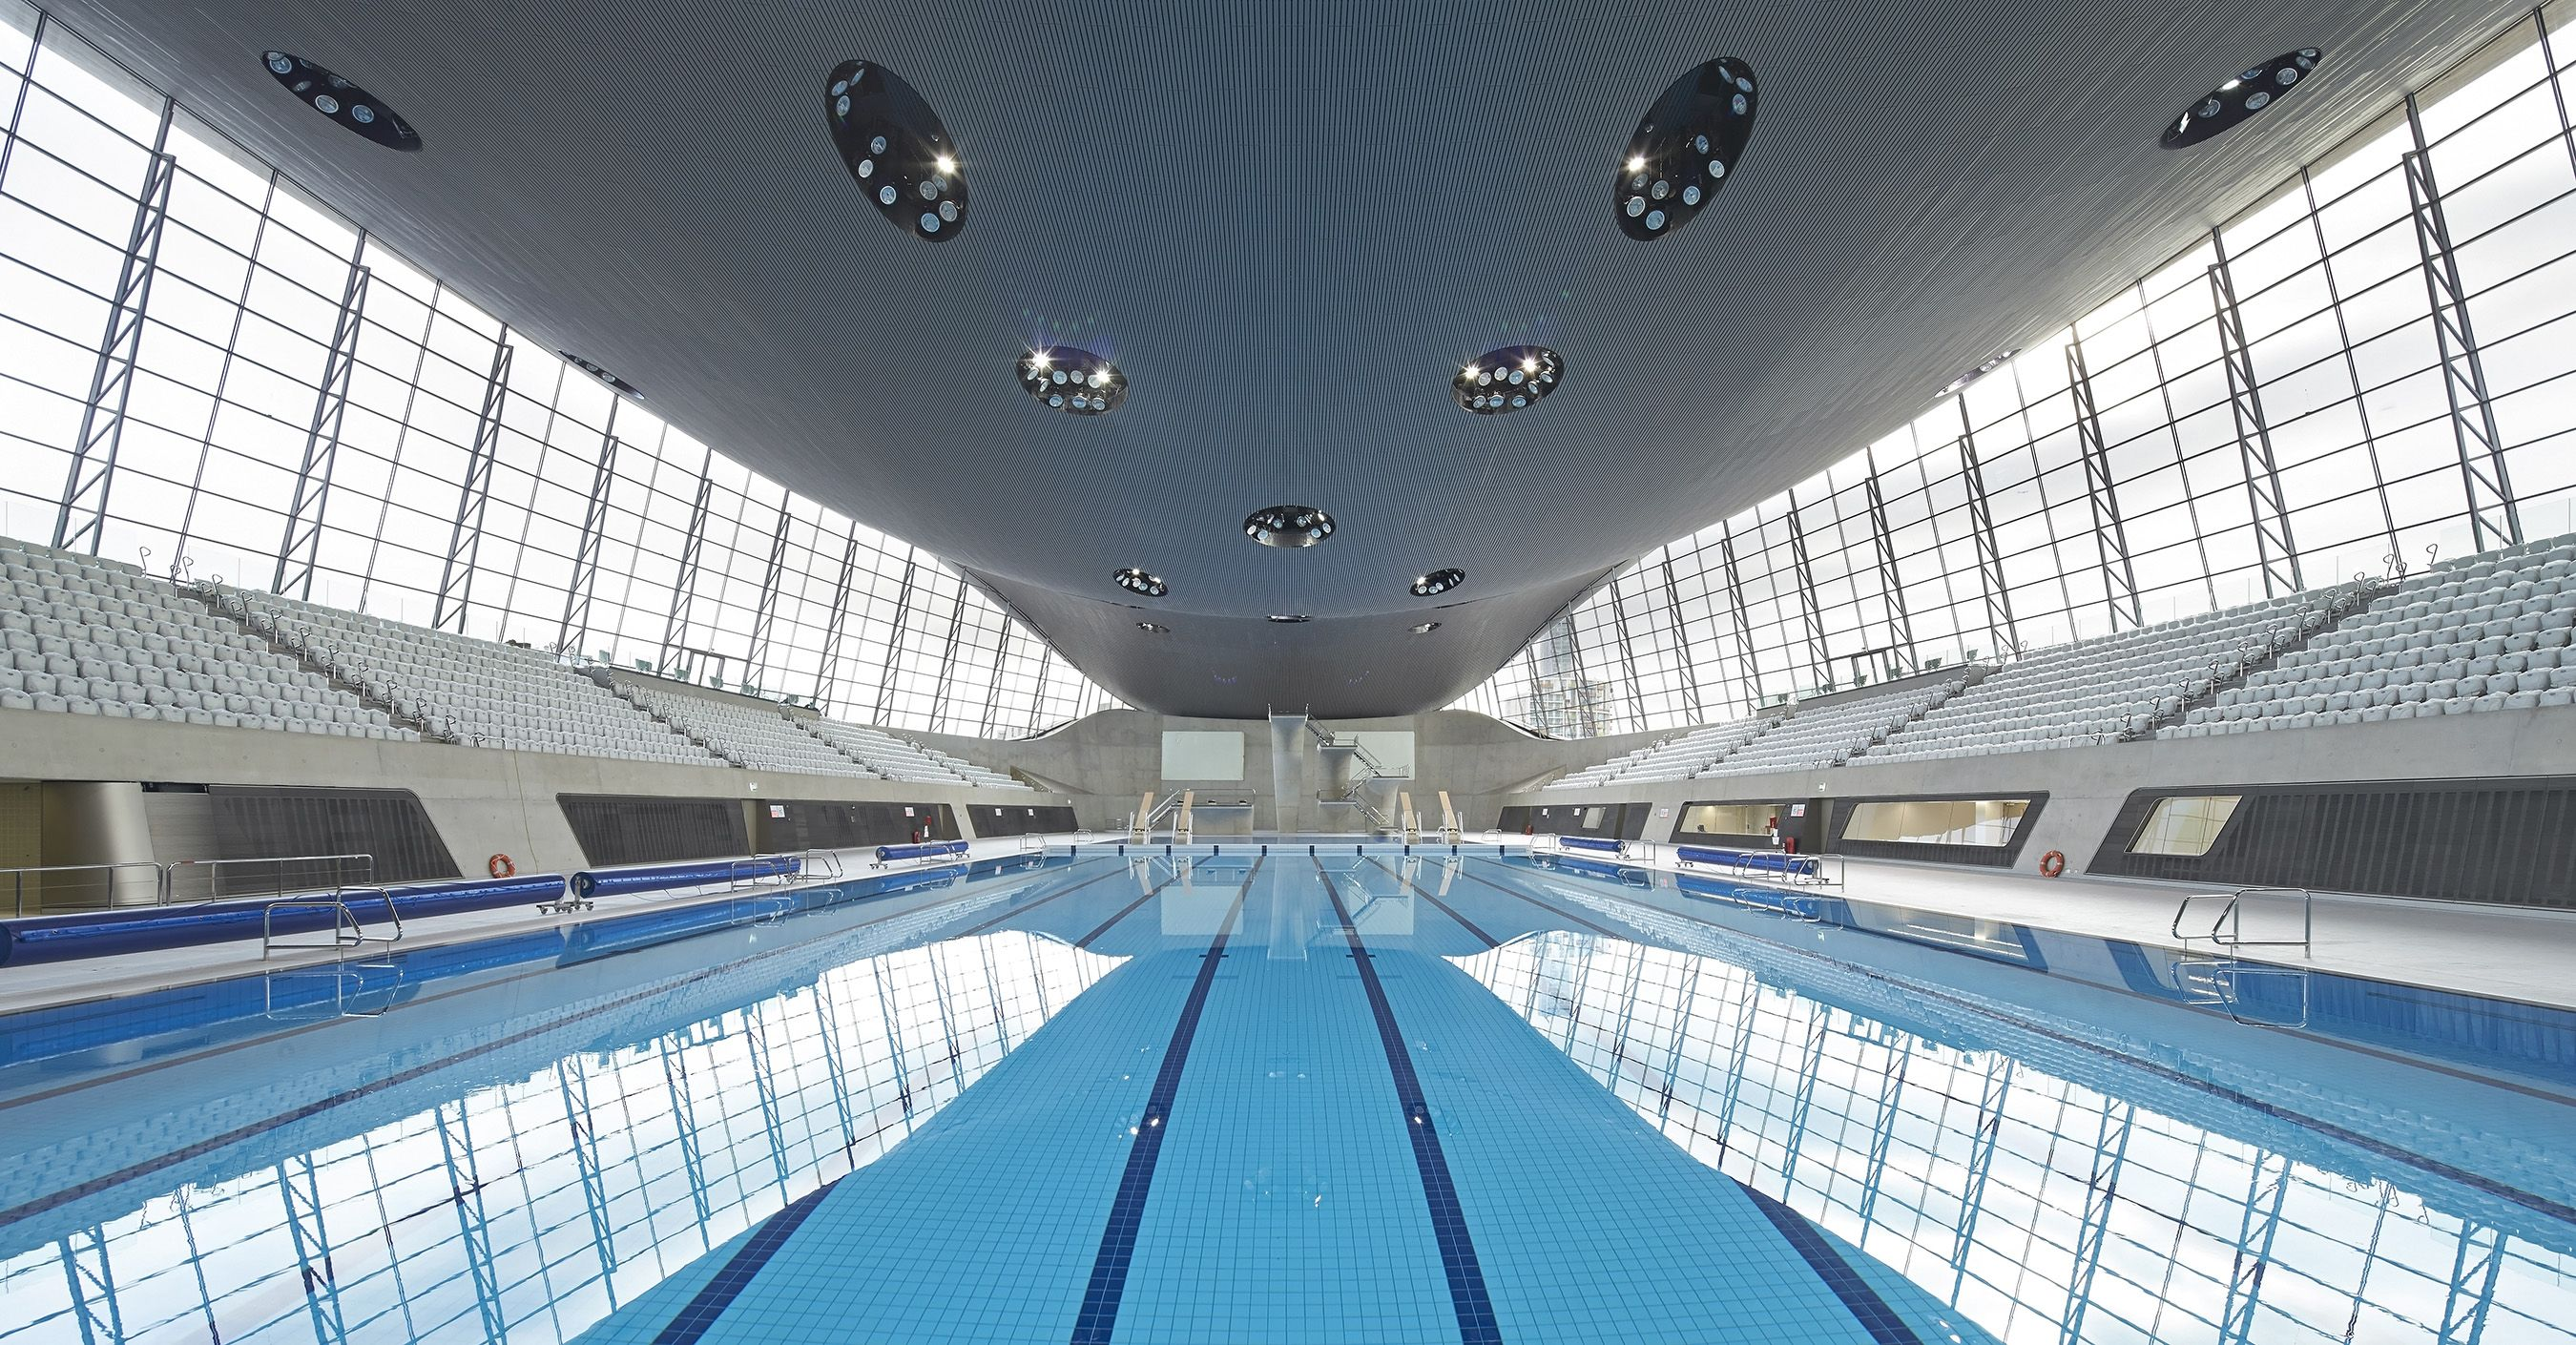 zaha hadid olympic legacy design london aquatics centre. Black Bedroom Furniture Sets. Home Design Ideas